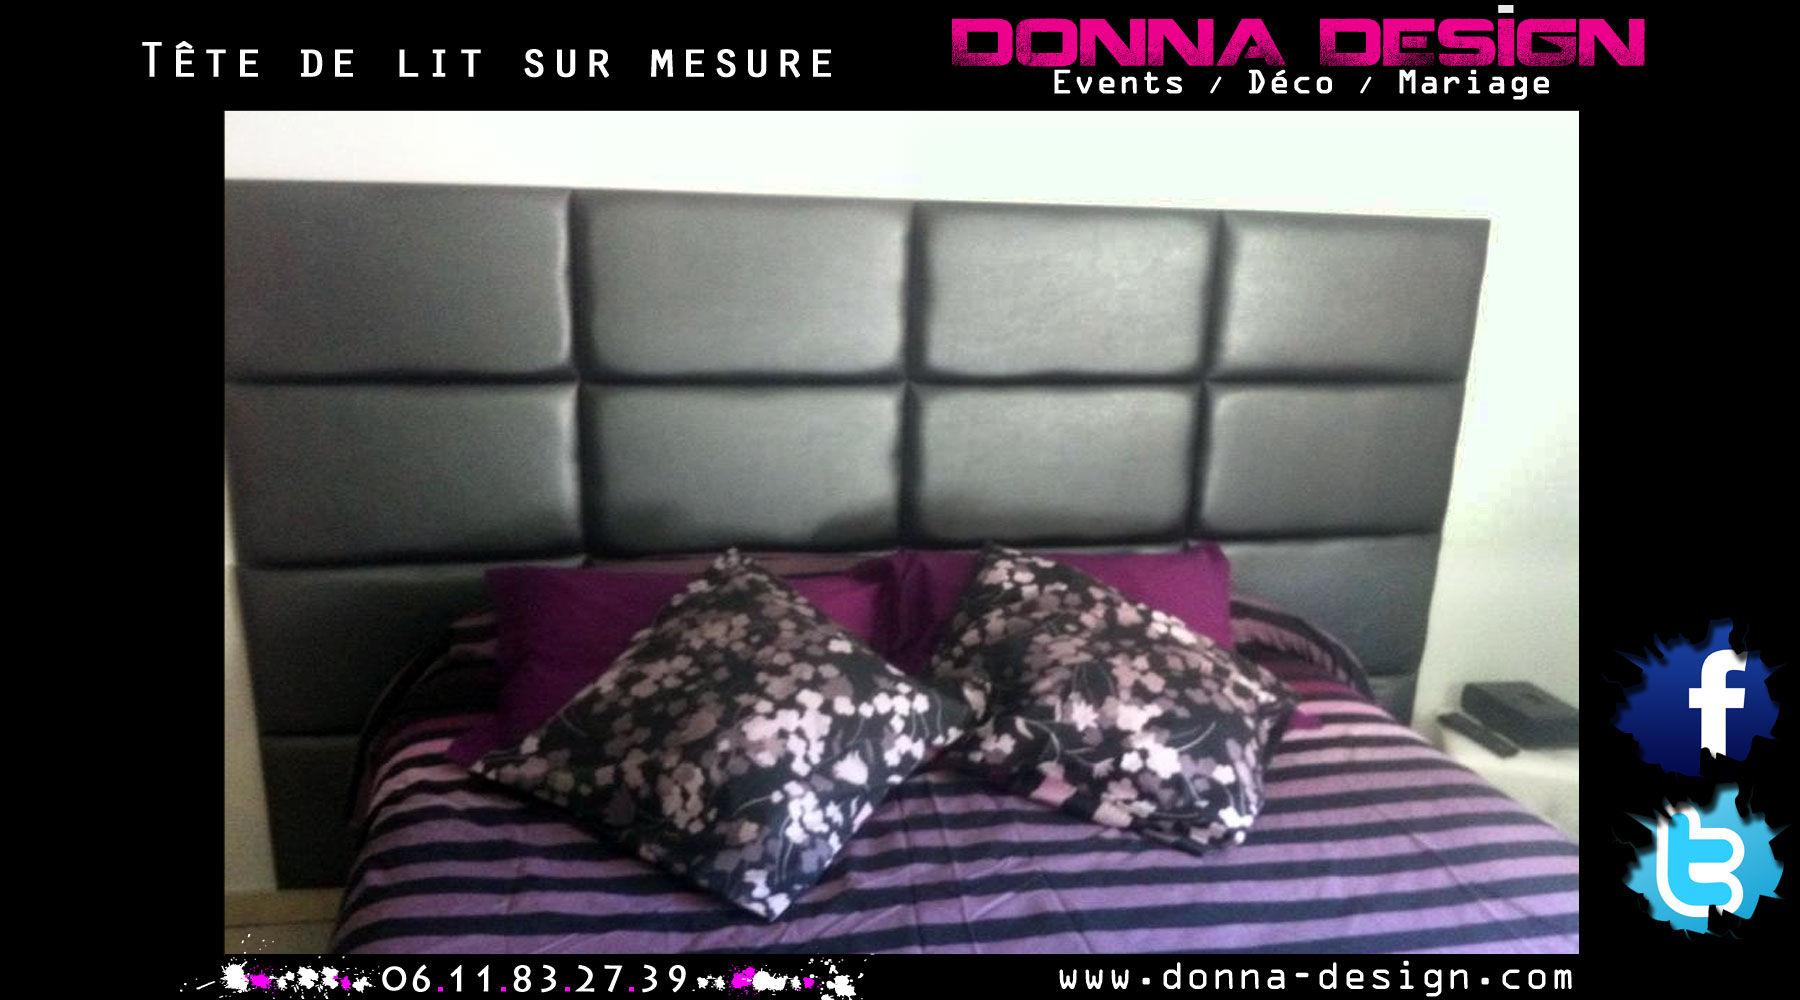 donna design d co mur capitonn houppa cabine dj marseille. Black Bedroom Furniture Sets. Home Design Ideas